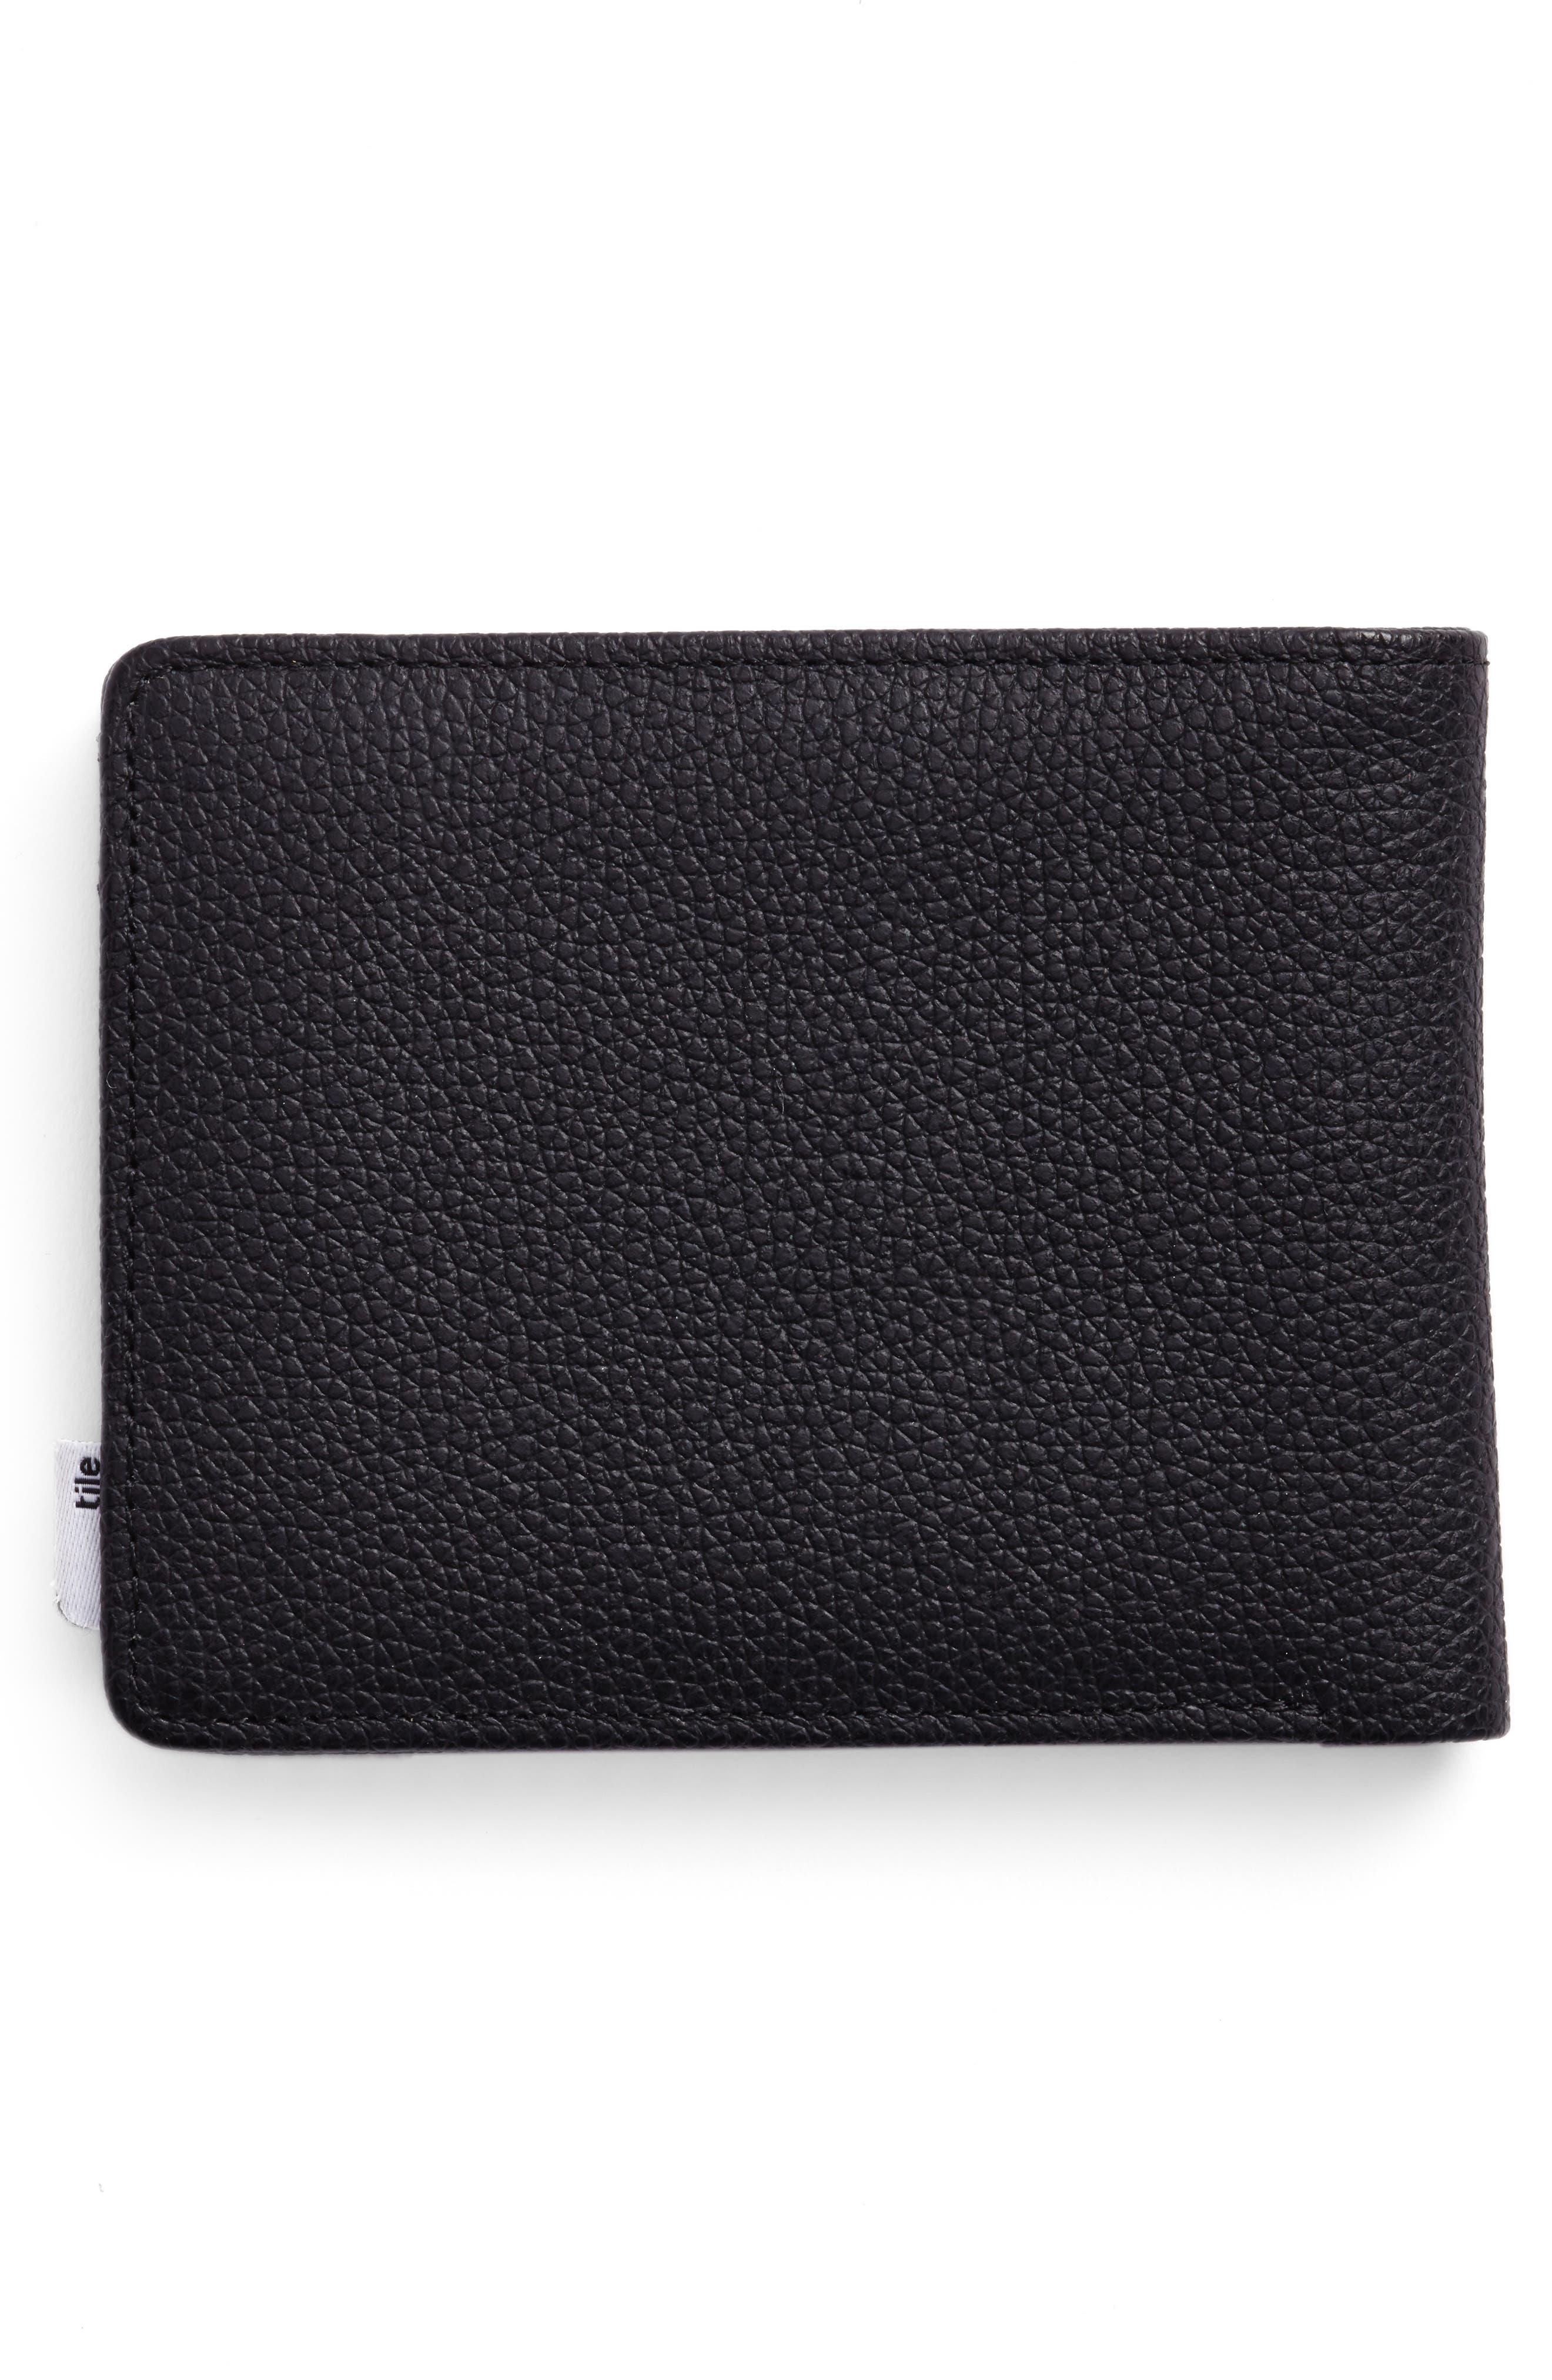 Tile Roy Leather Wallet,                             Alternate thumbnail 3, color,